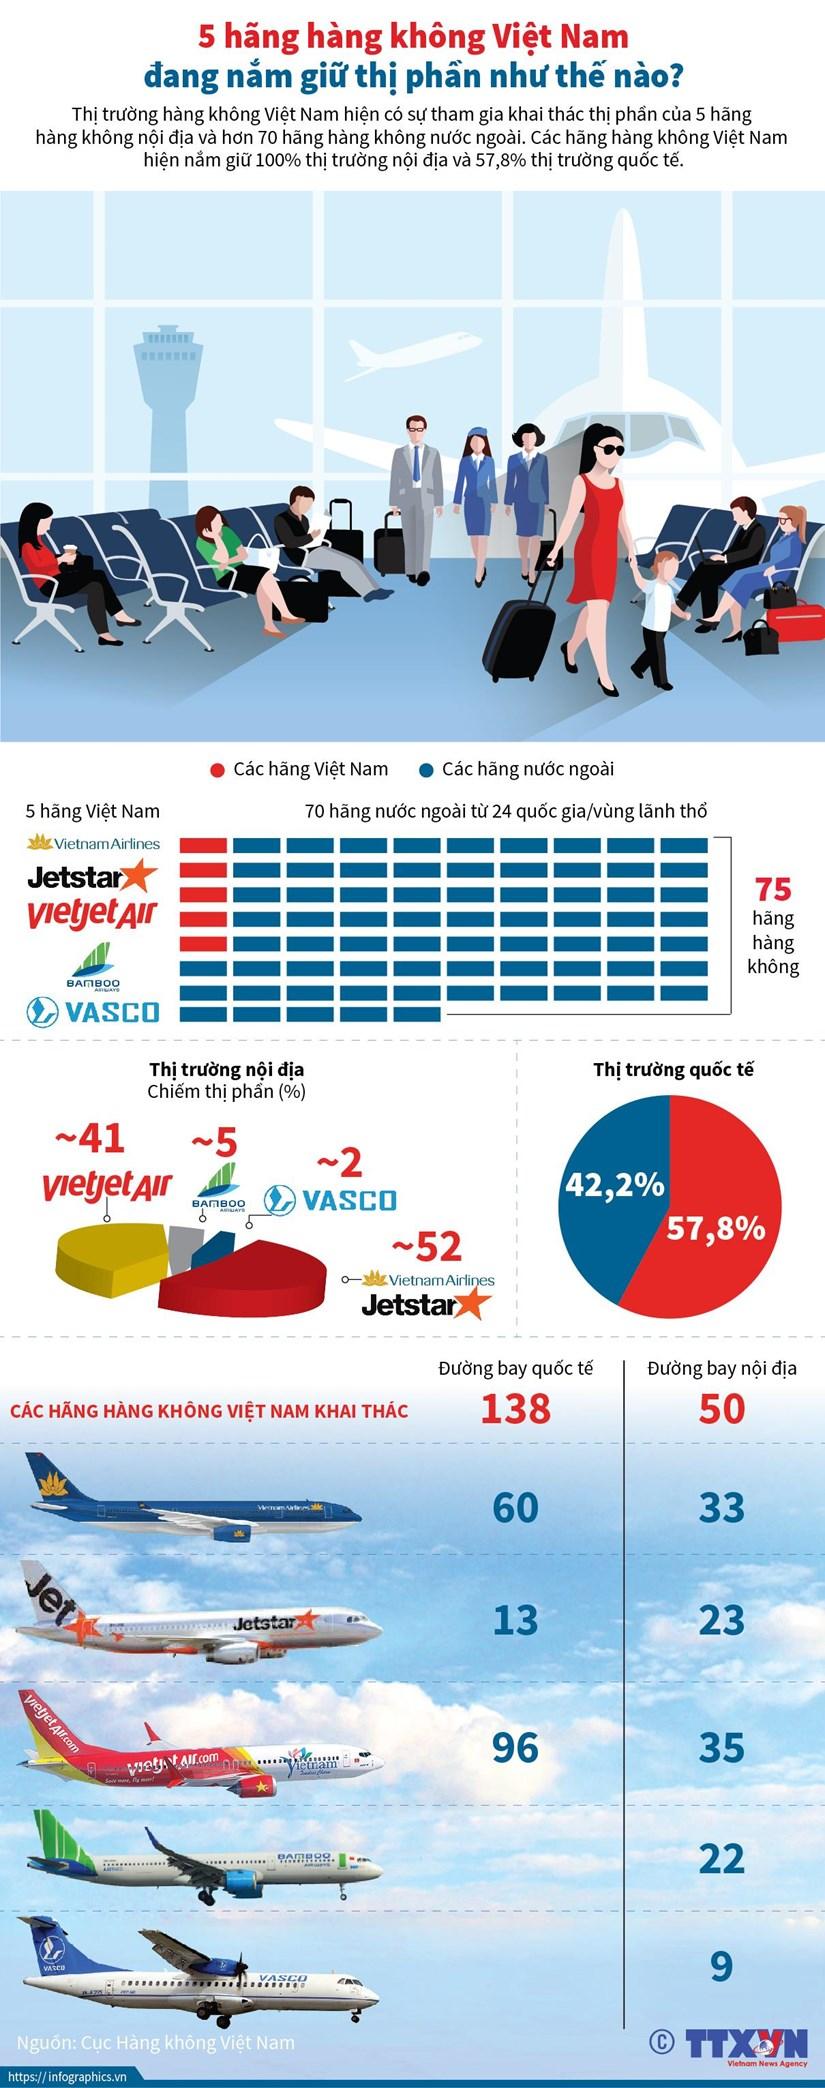 infographics thi phan cua 5 hang hang khong viet nam tai noi dia